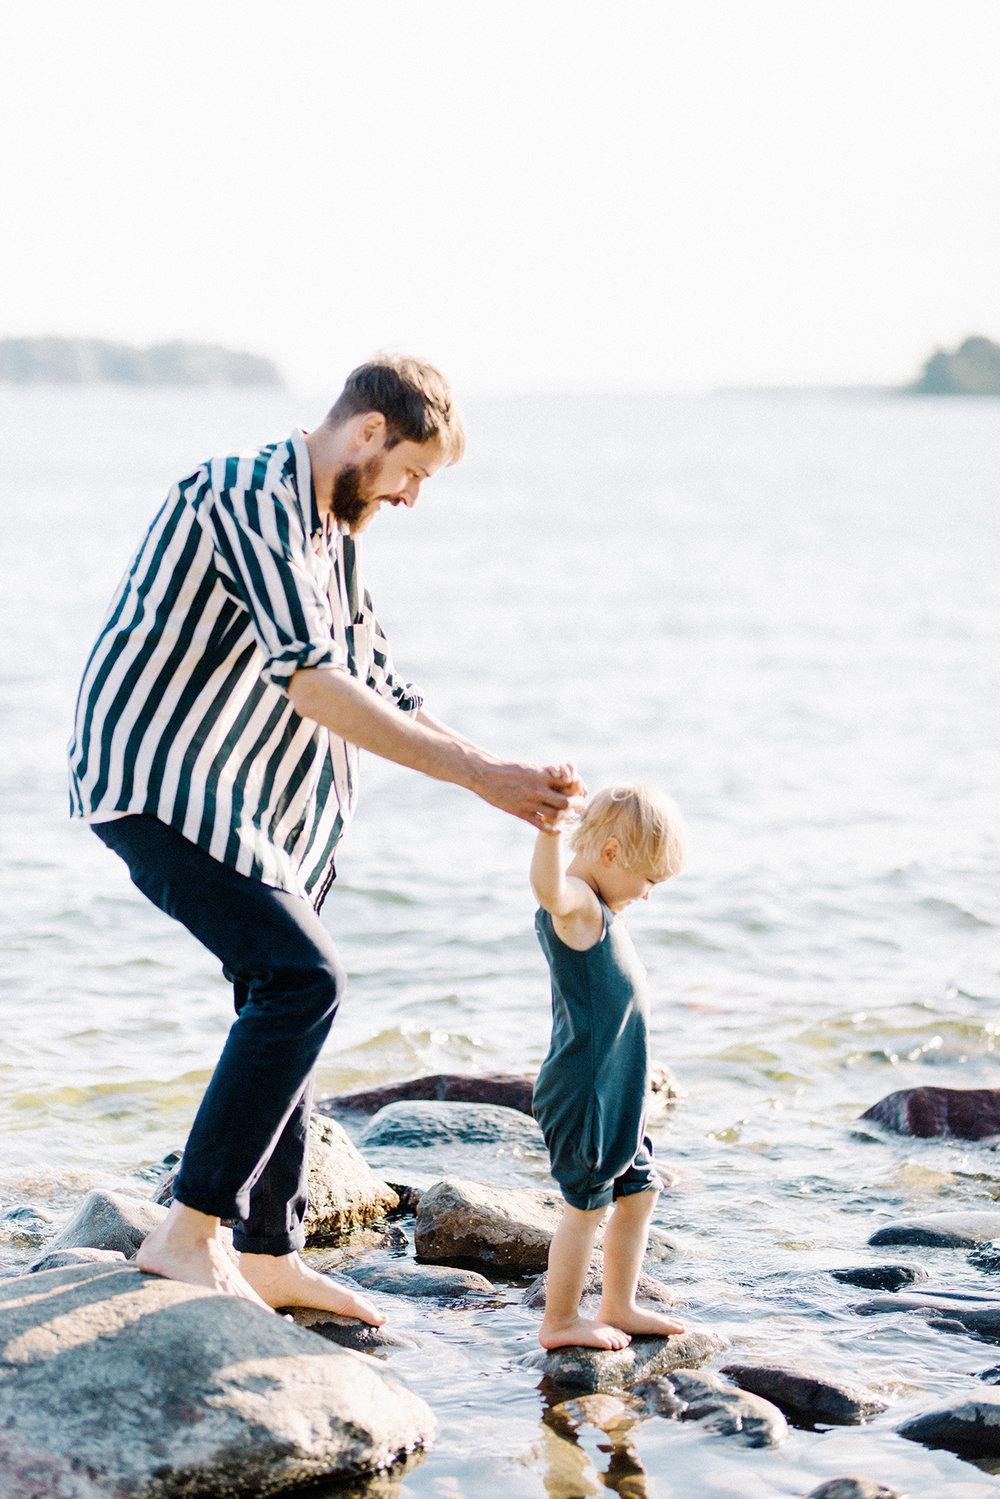 Family Shoot By the Sea in Helsinki, Finland